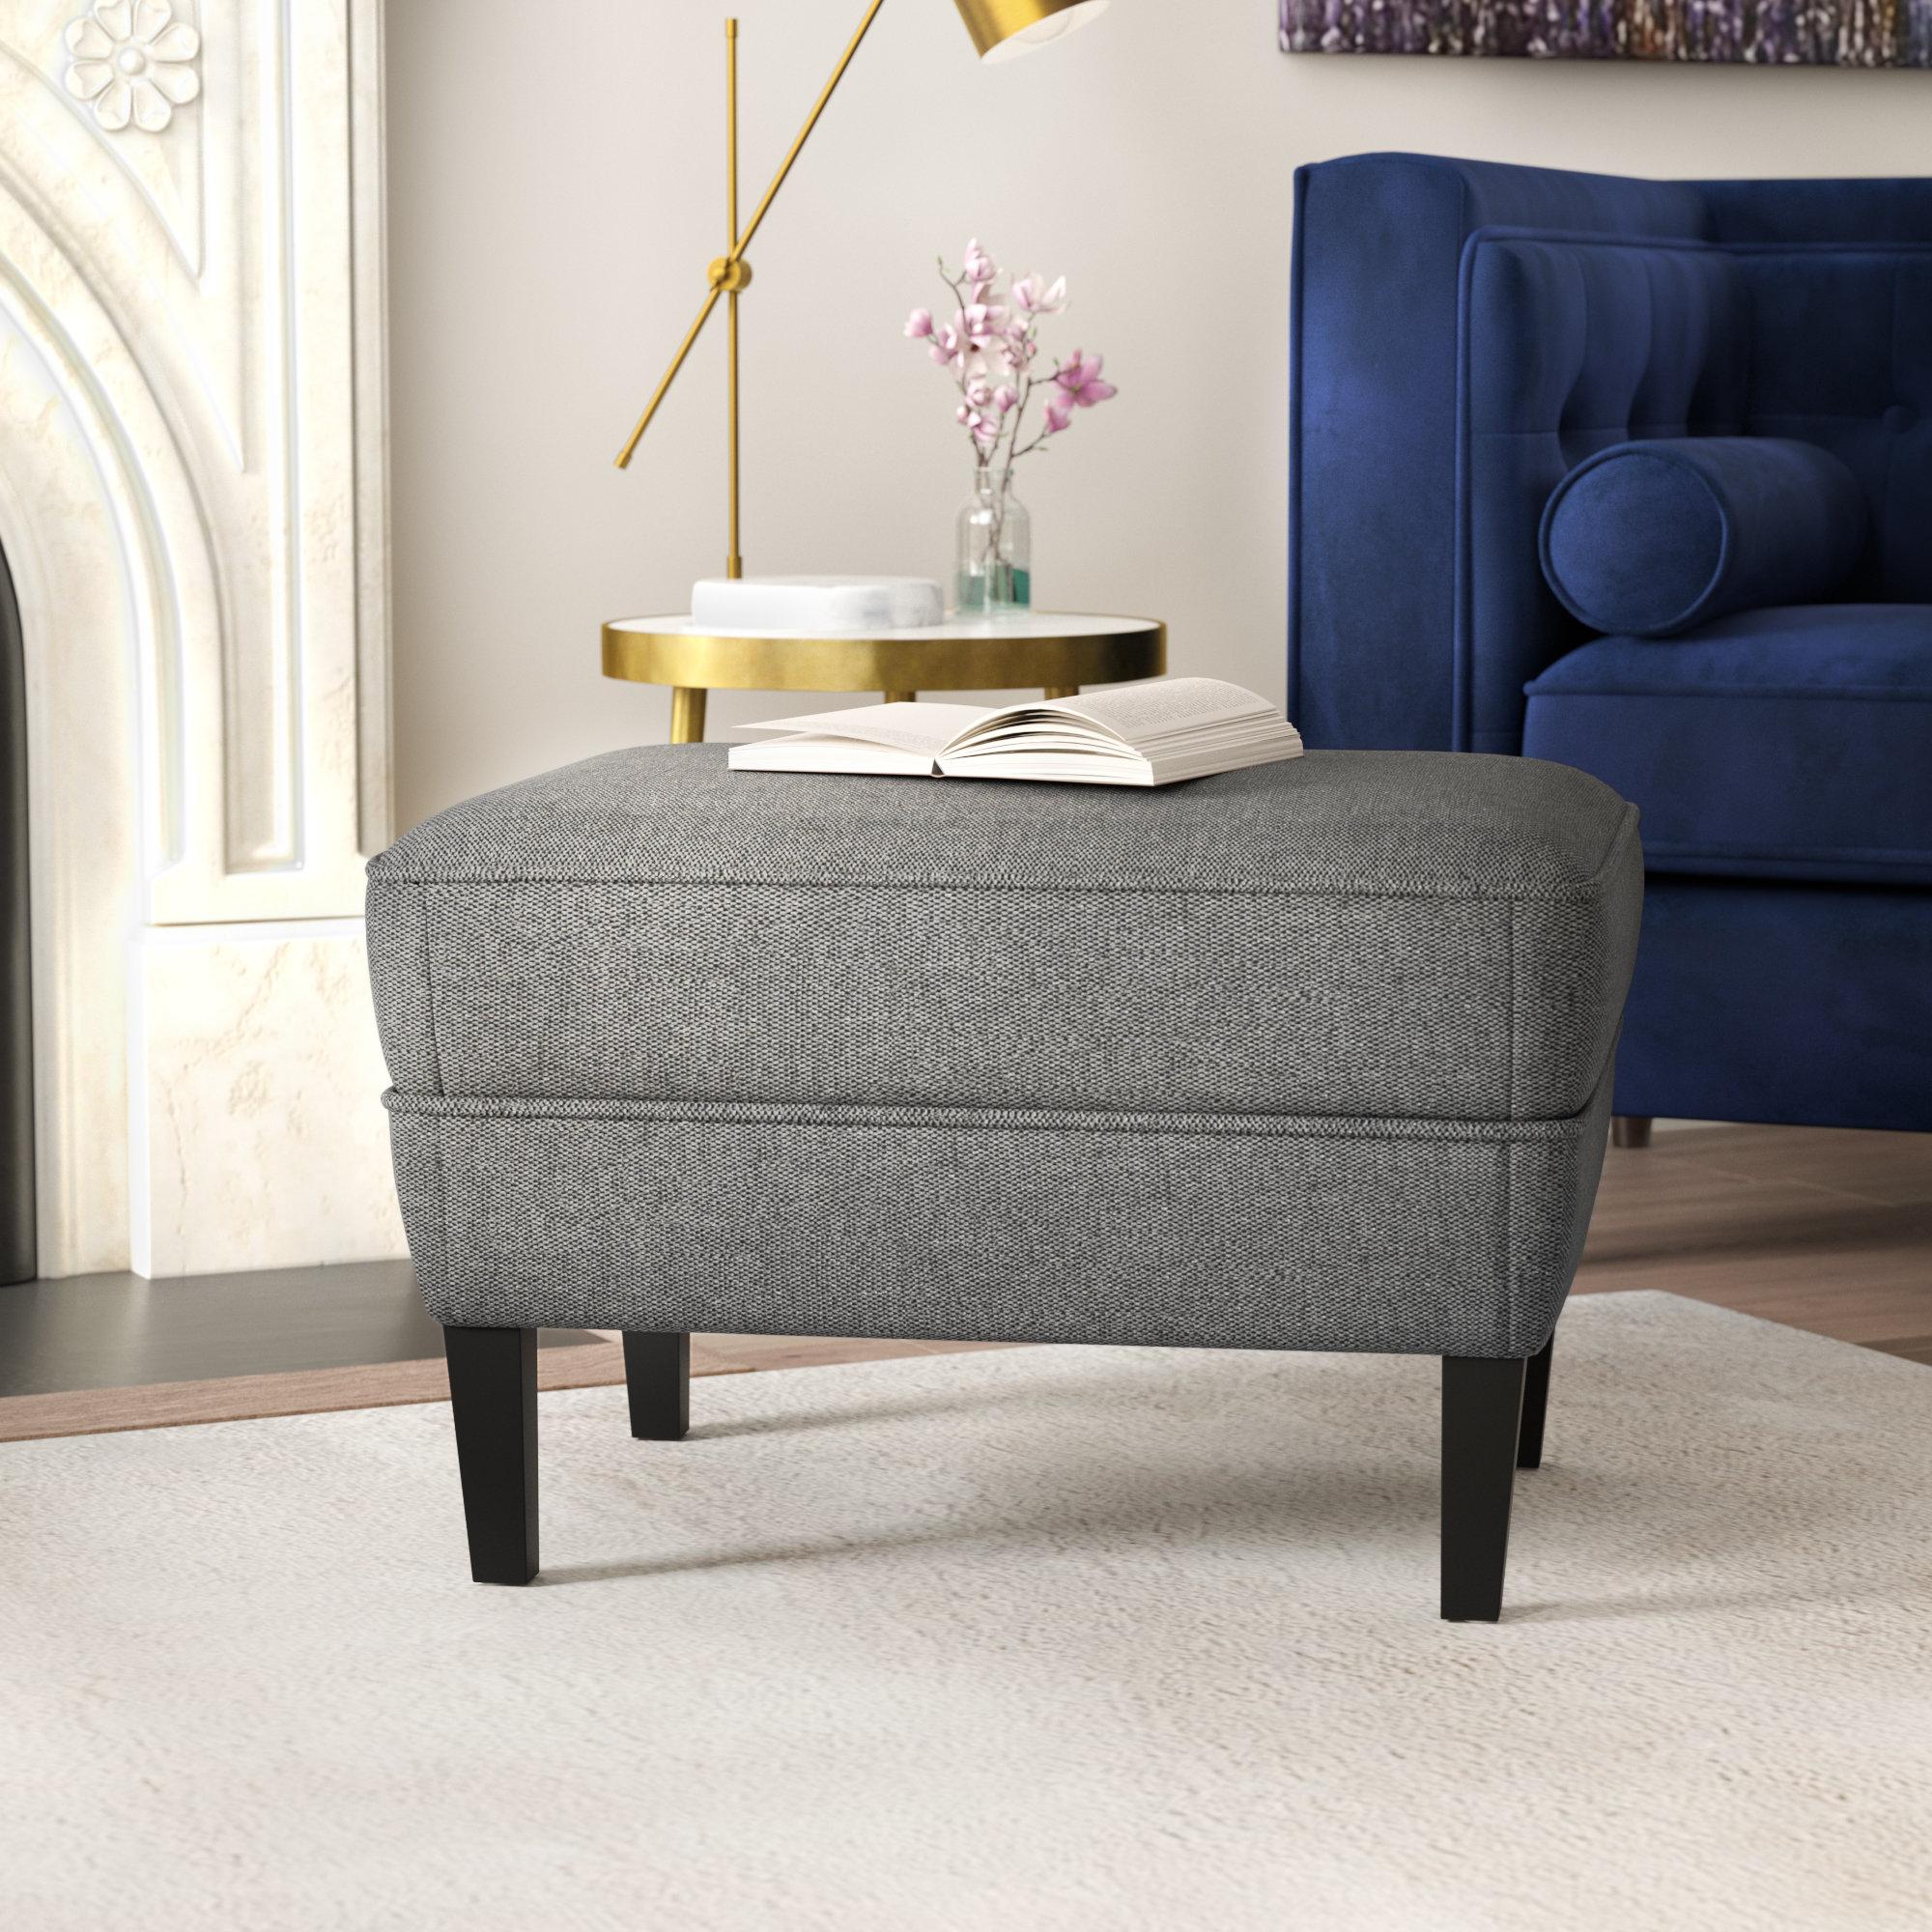 Willa Arlo Interiors Aquarius Ottoman & Reviews | Wayfair Inside Aquarius Dark Grey Sofa Chairs (View 9 of 25)